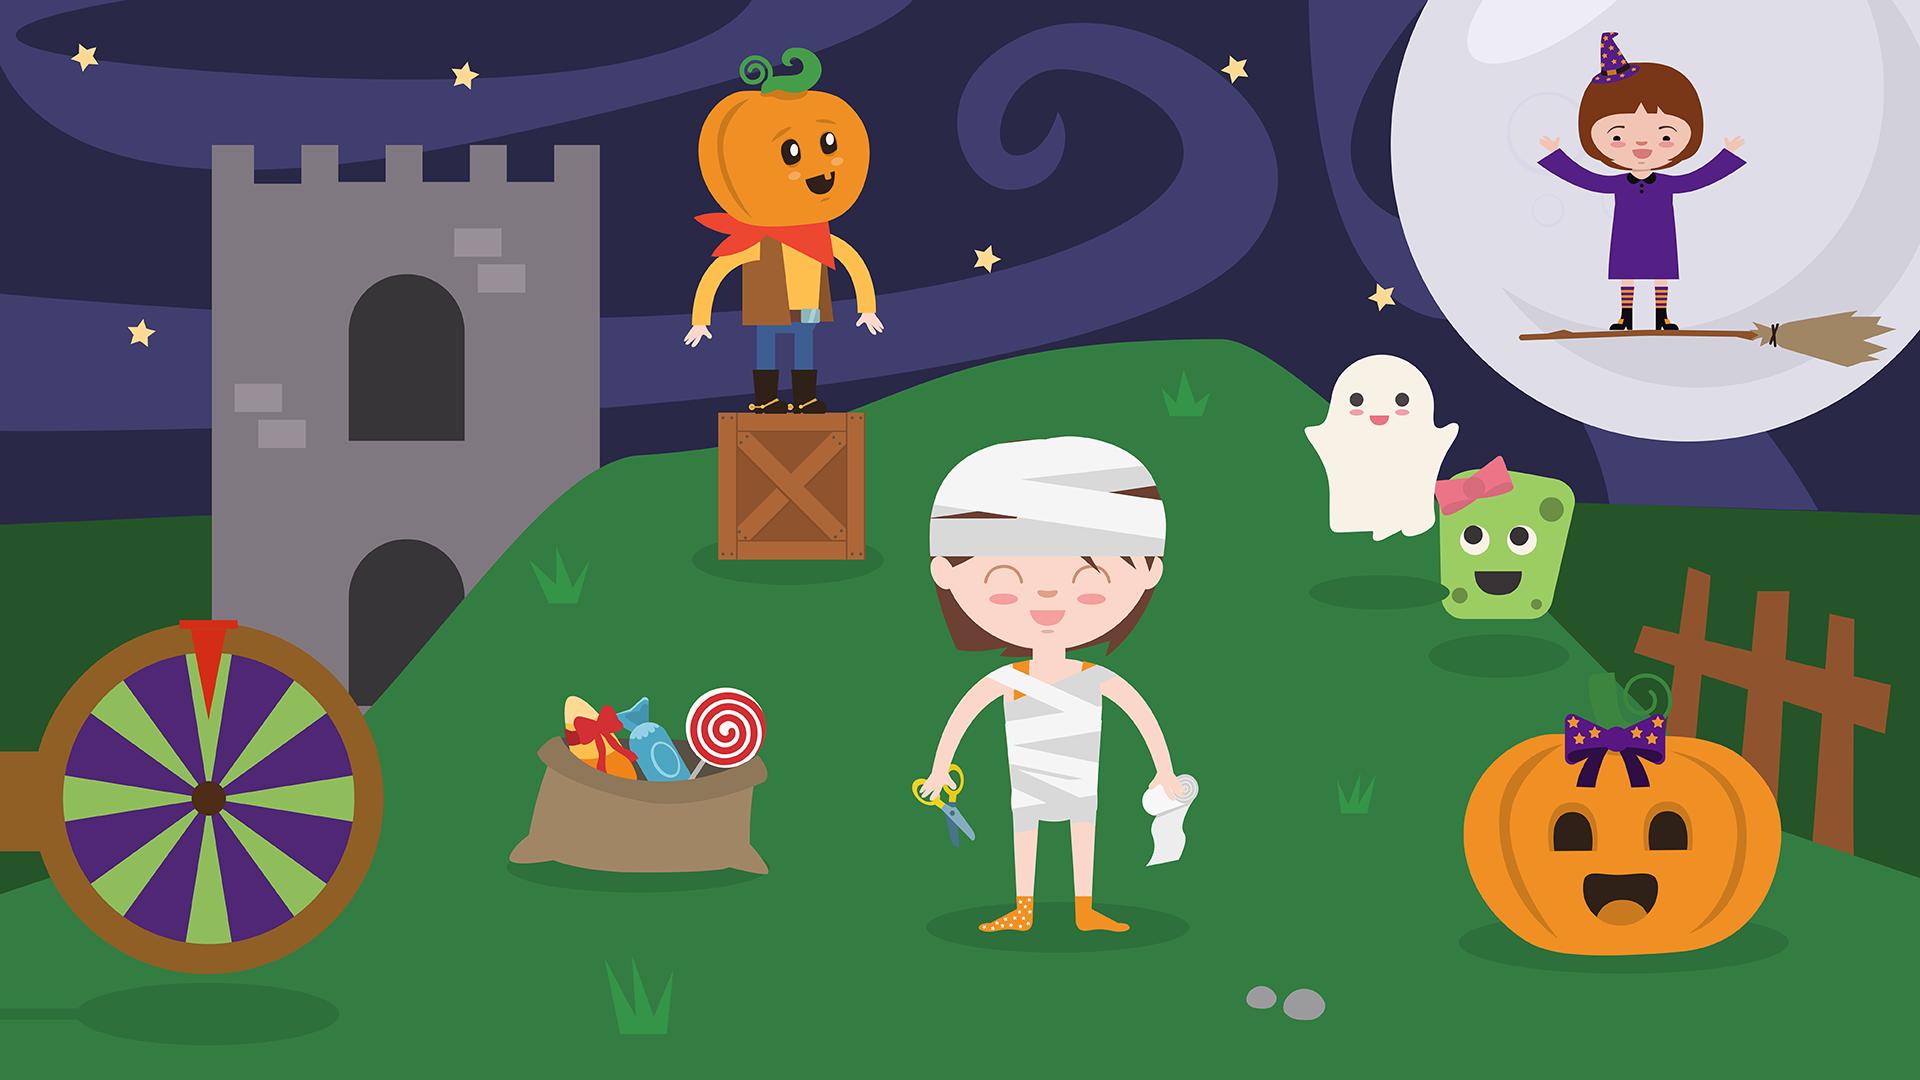 WOOF: Halloween Bash!